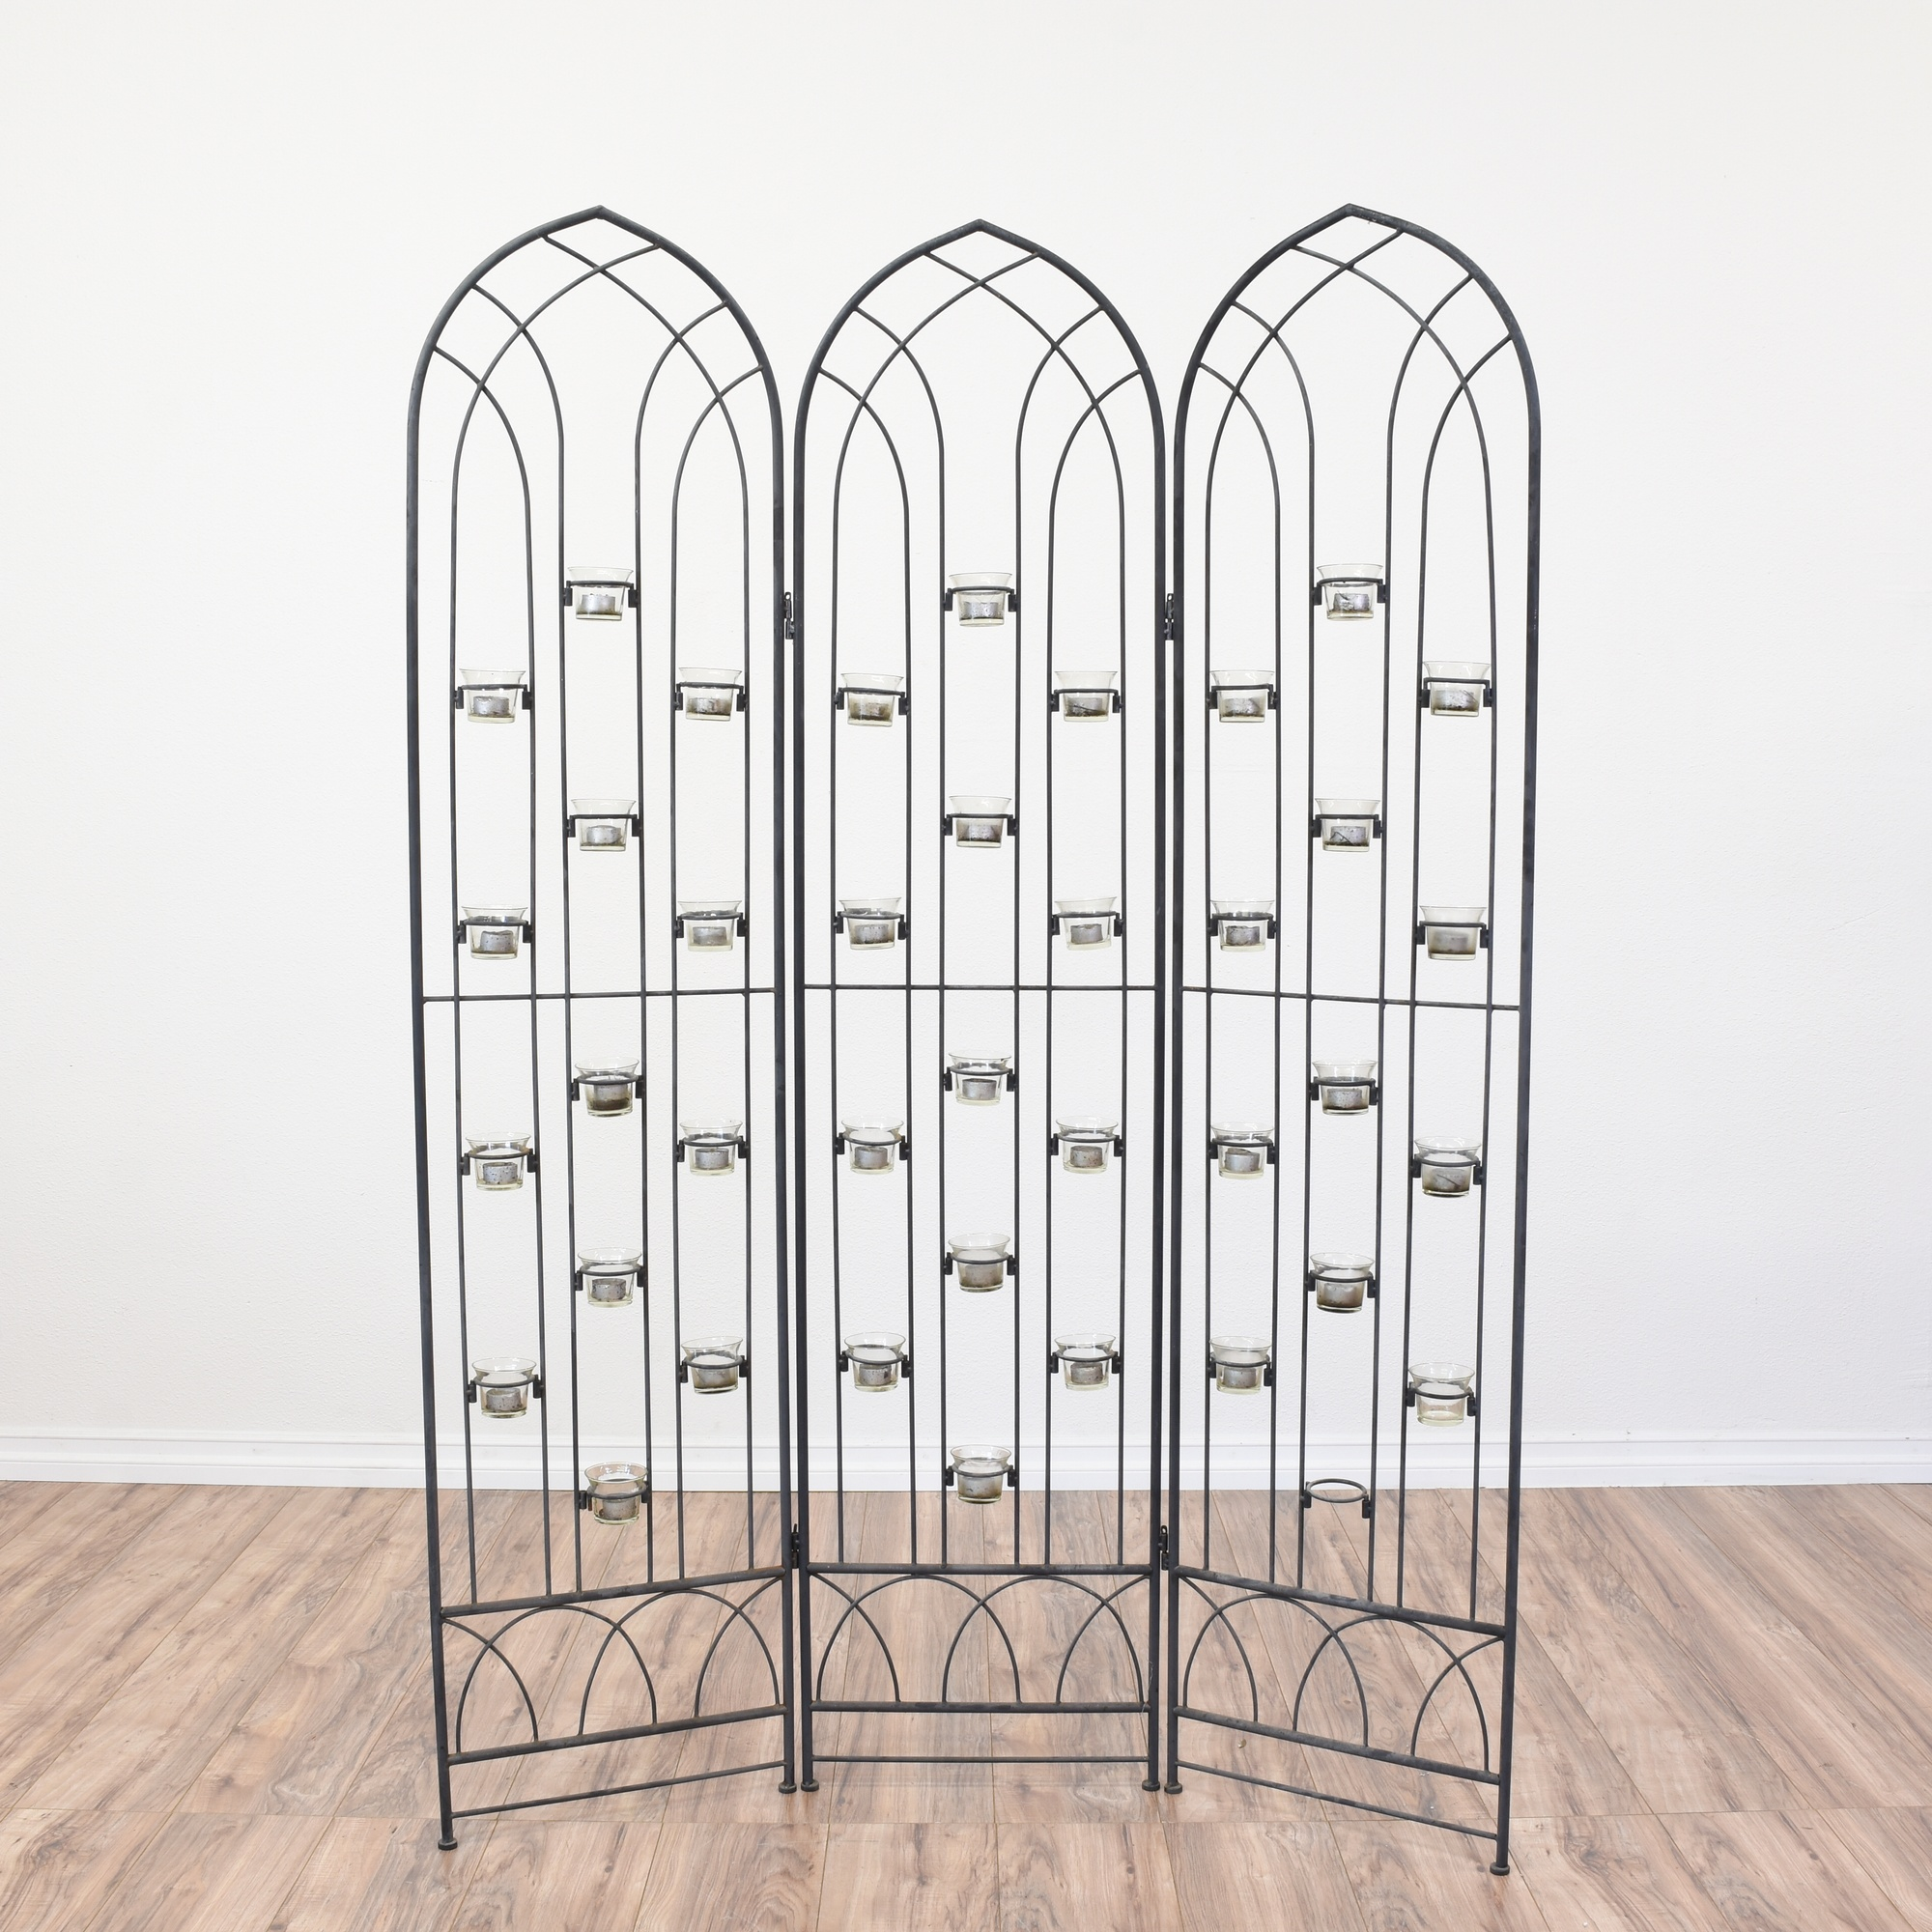 Black Bent Metal Room Divider Candle Holder Loveseat Online Auctions San Diego